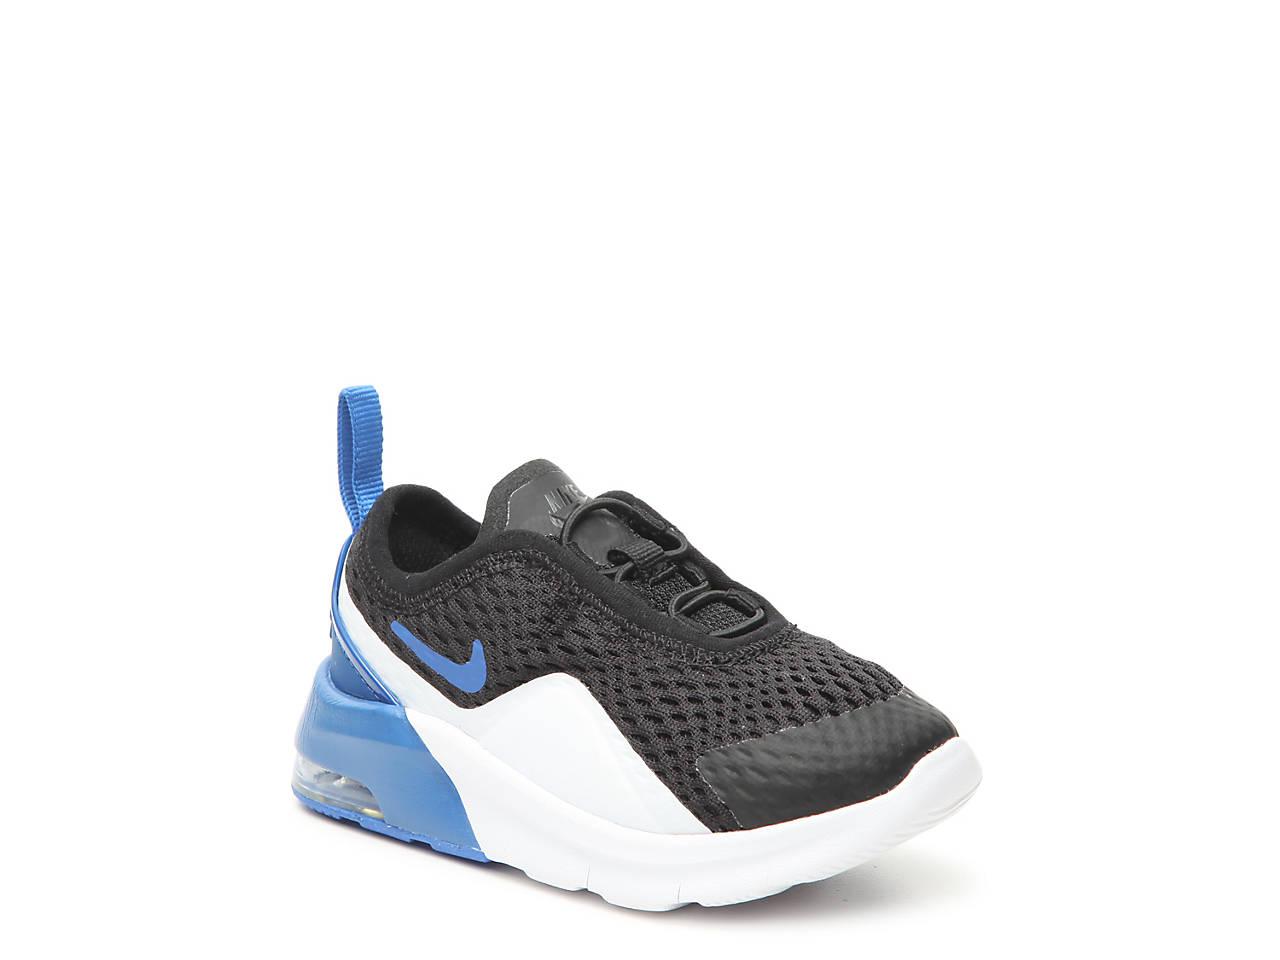 low priced 14414 8863d Nike. Air Max Motion 2 Toddler Slip-On Sneaker